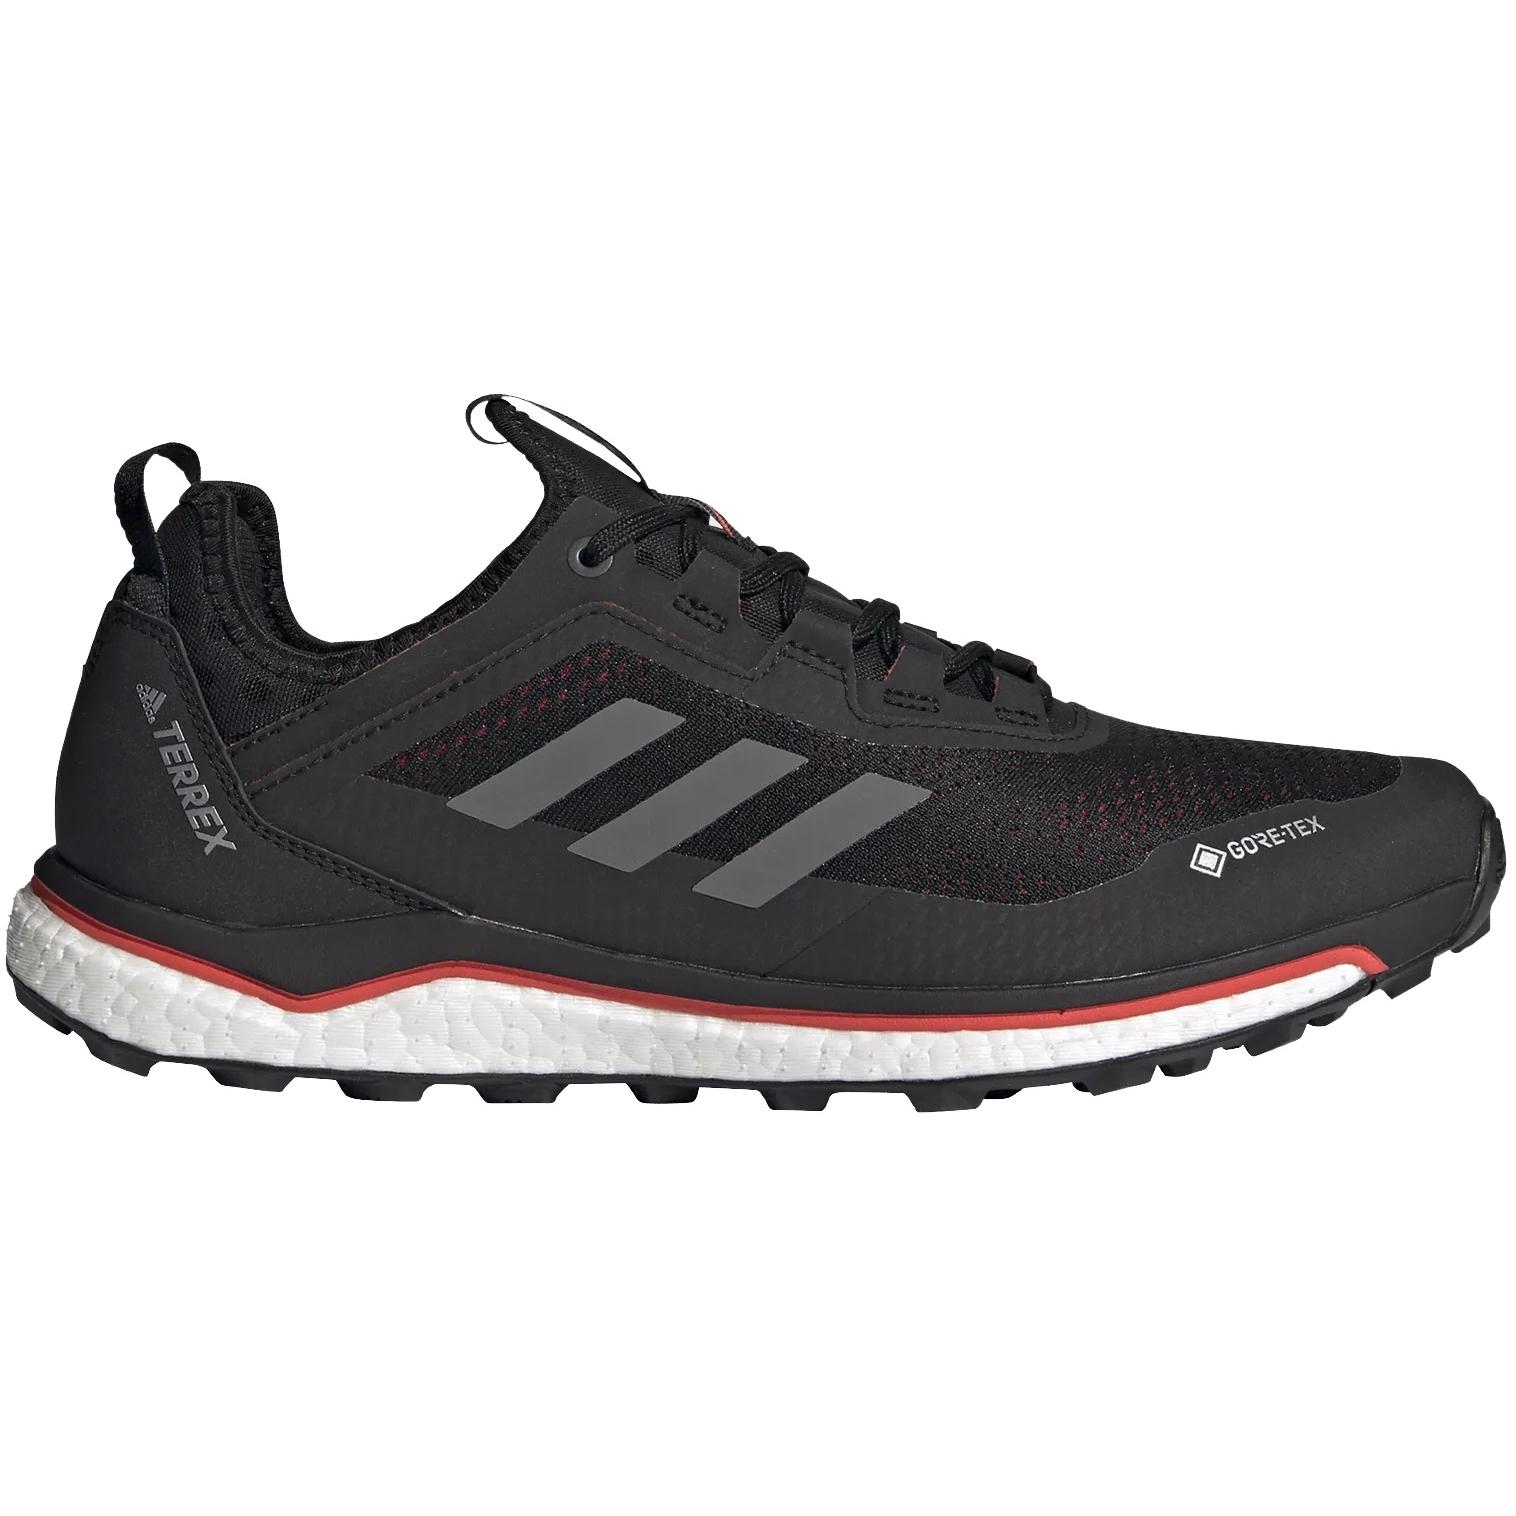 adidas Männer TERREX Agravic Flow GORE-TEX Trailrunning-Schuhe - core black/grey four/solar red FU7448